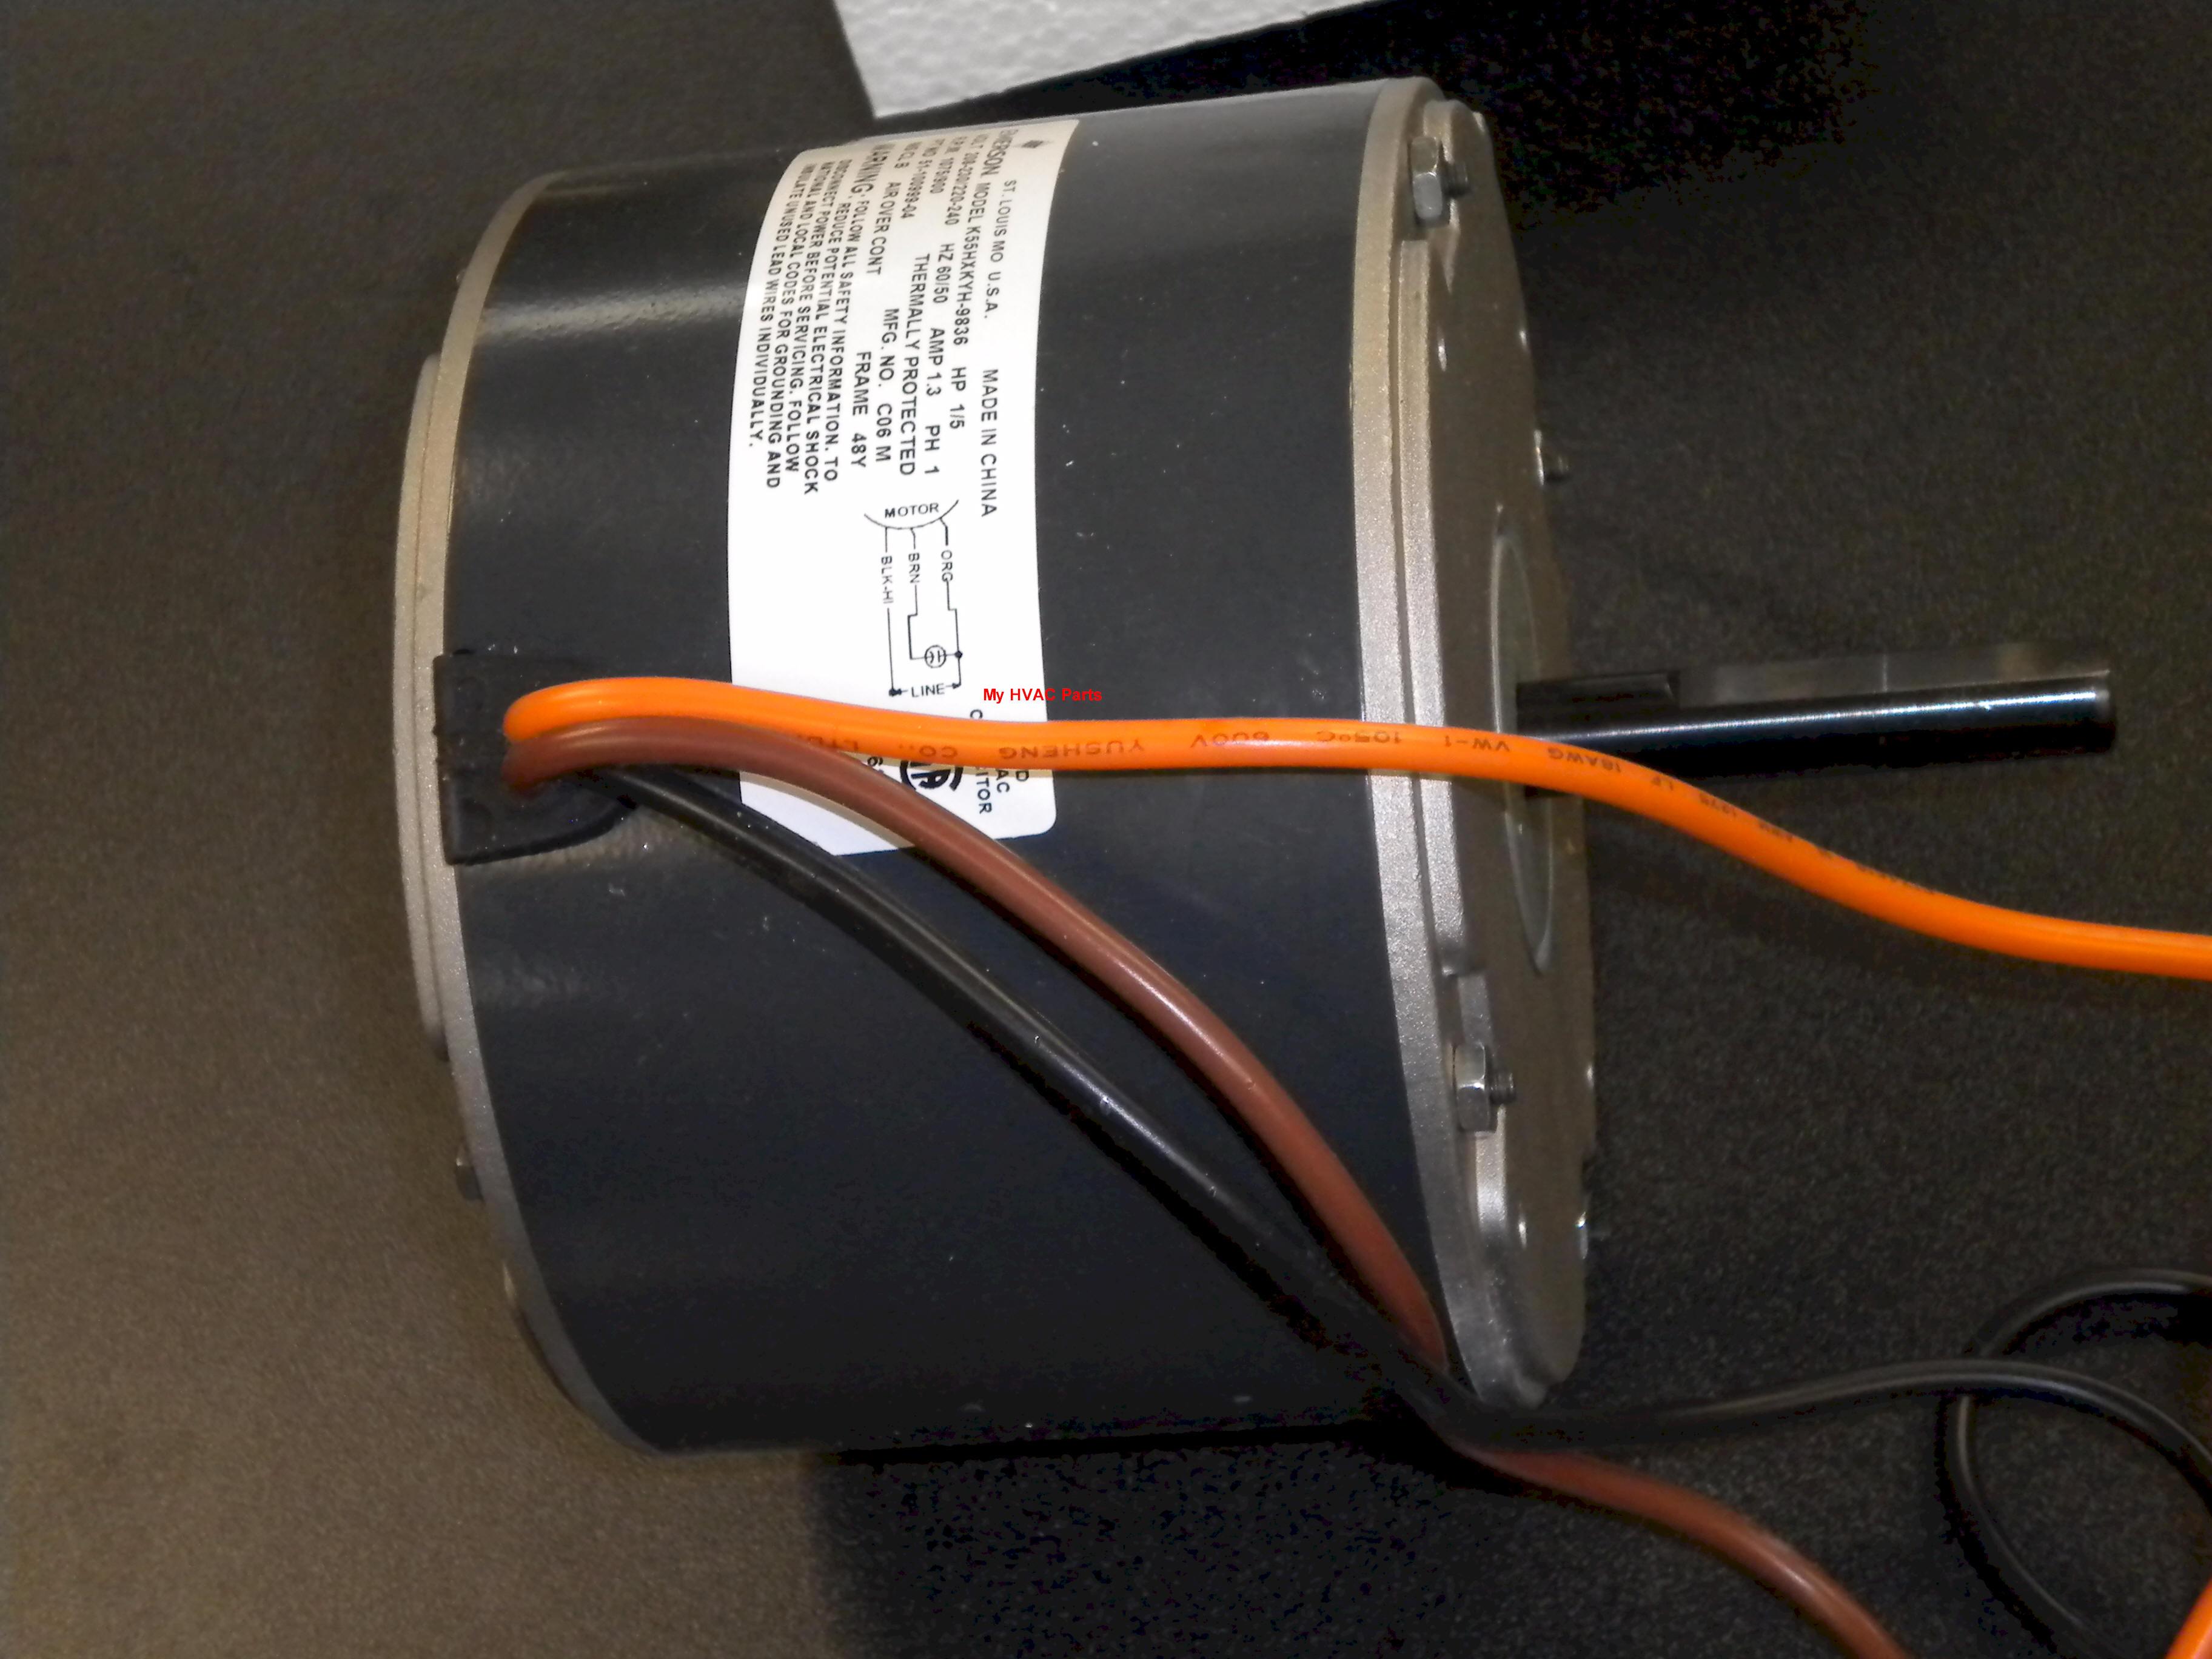 LV_8153] Condenser Fan Motor Wiring To 4 Wire Condenser Fan Free DiagramTzici Tial Benkeme Momece Over Oliti Mentra Mohammedshrine Librar Wiring 101